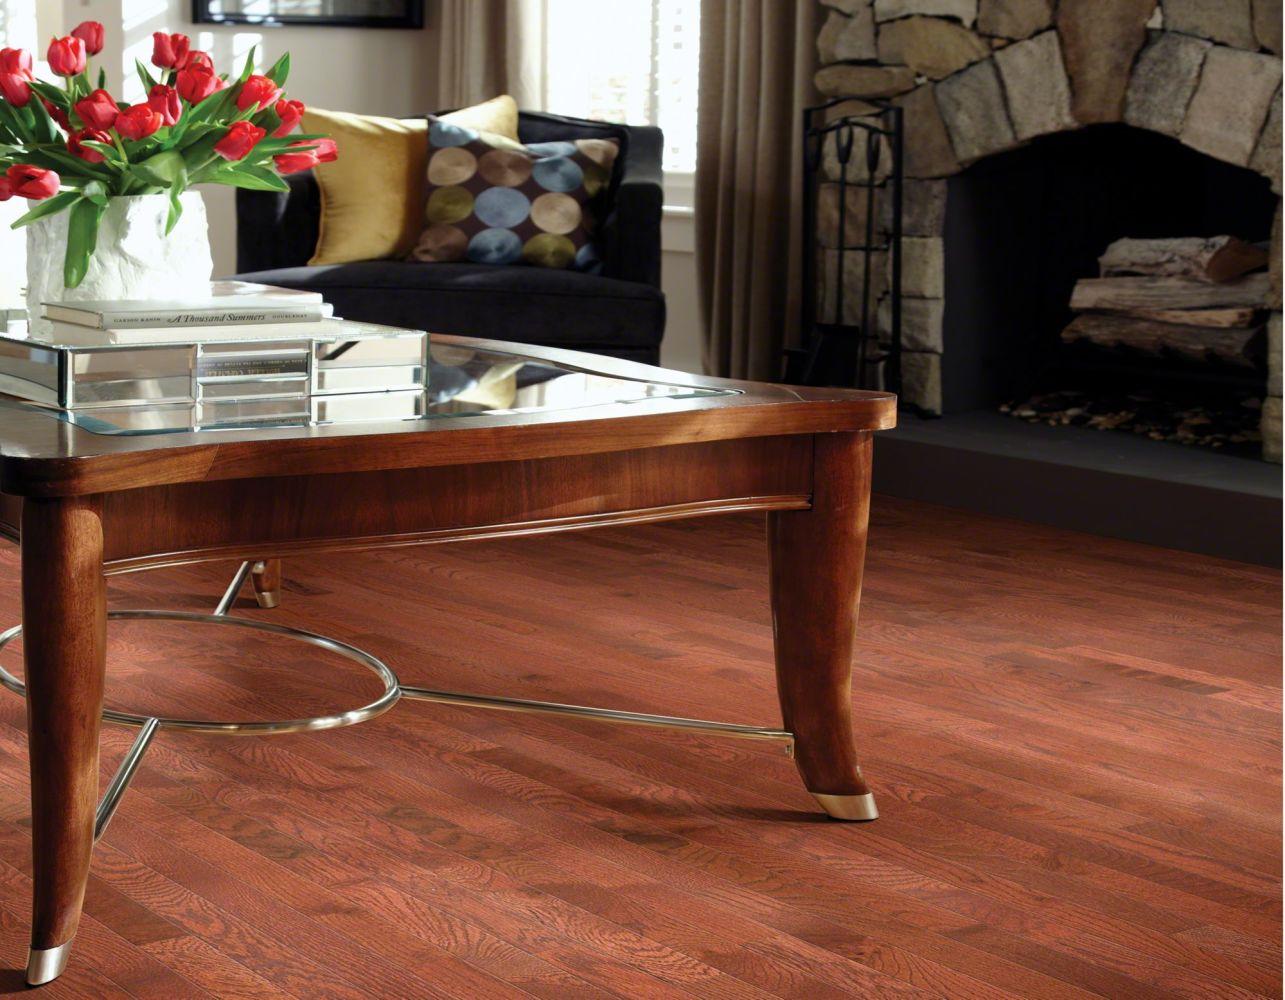 Shaw Floors Oak Solid Golden Opportunity 2 1/4″ 4s Cherry 00947_SW442